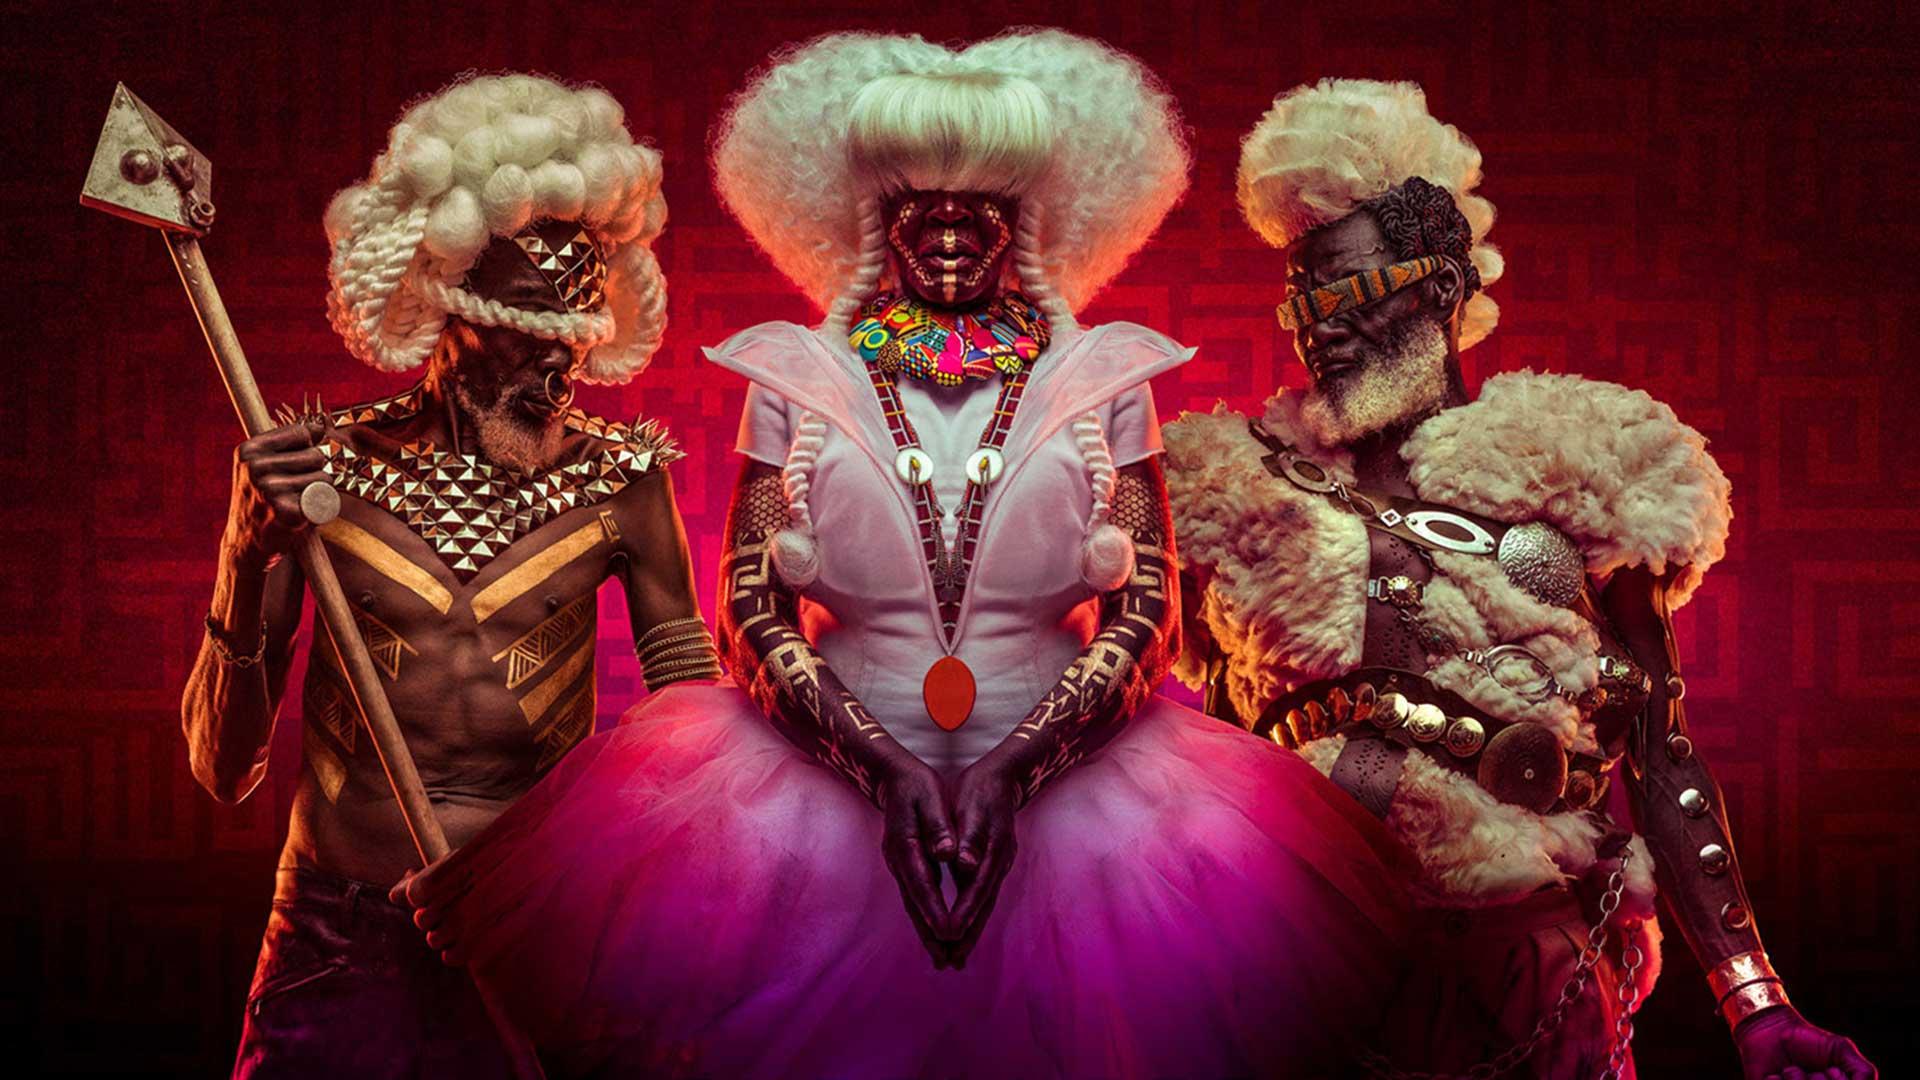 wakilisha-creative-enterprise-kenyan-artists-osborne-macharia-for-marvel-black-panther